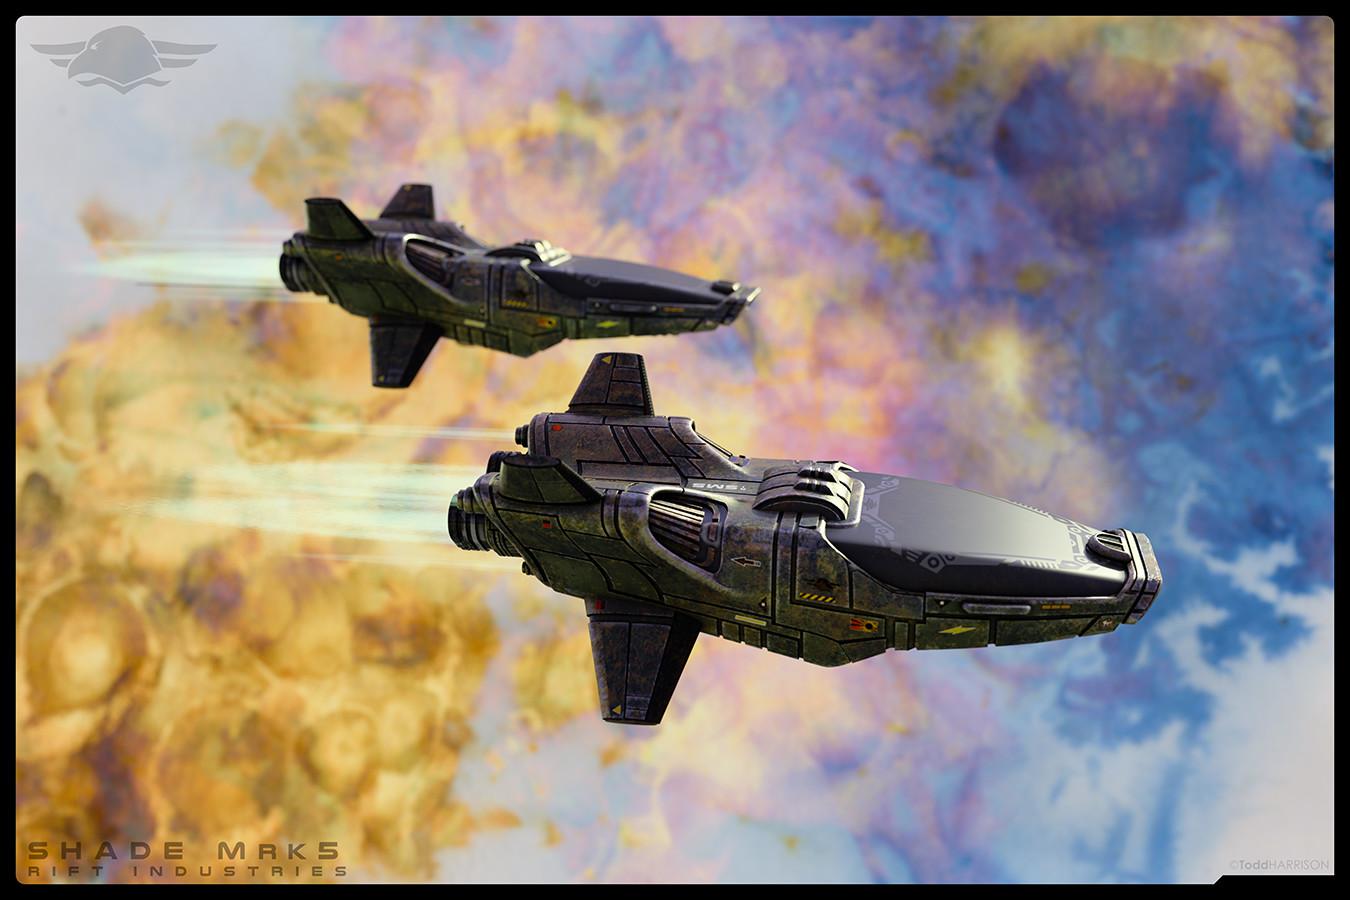 Todd harrison ri shade mrk5 pair patrol web